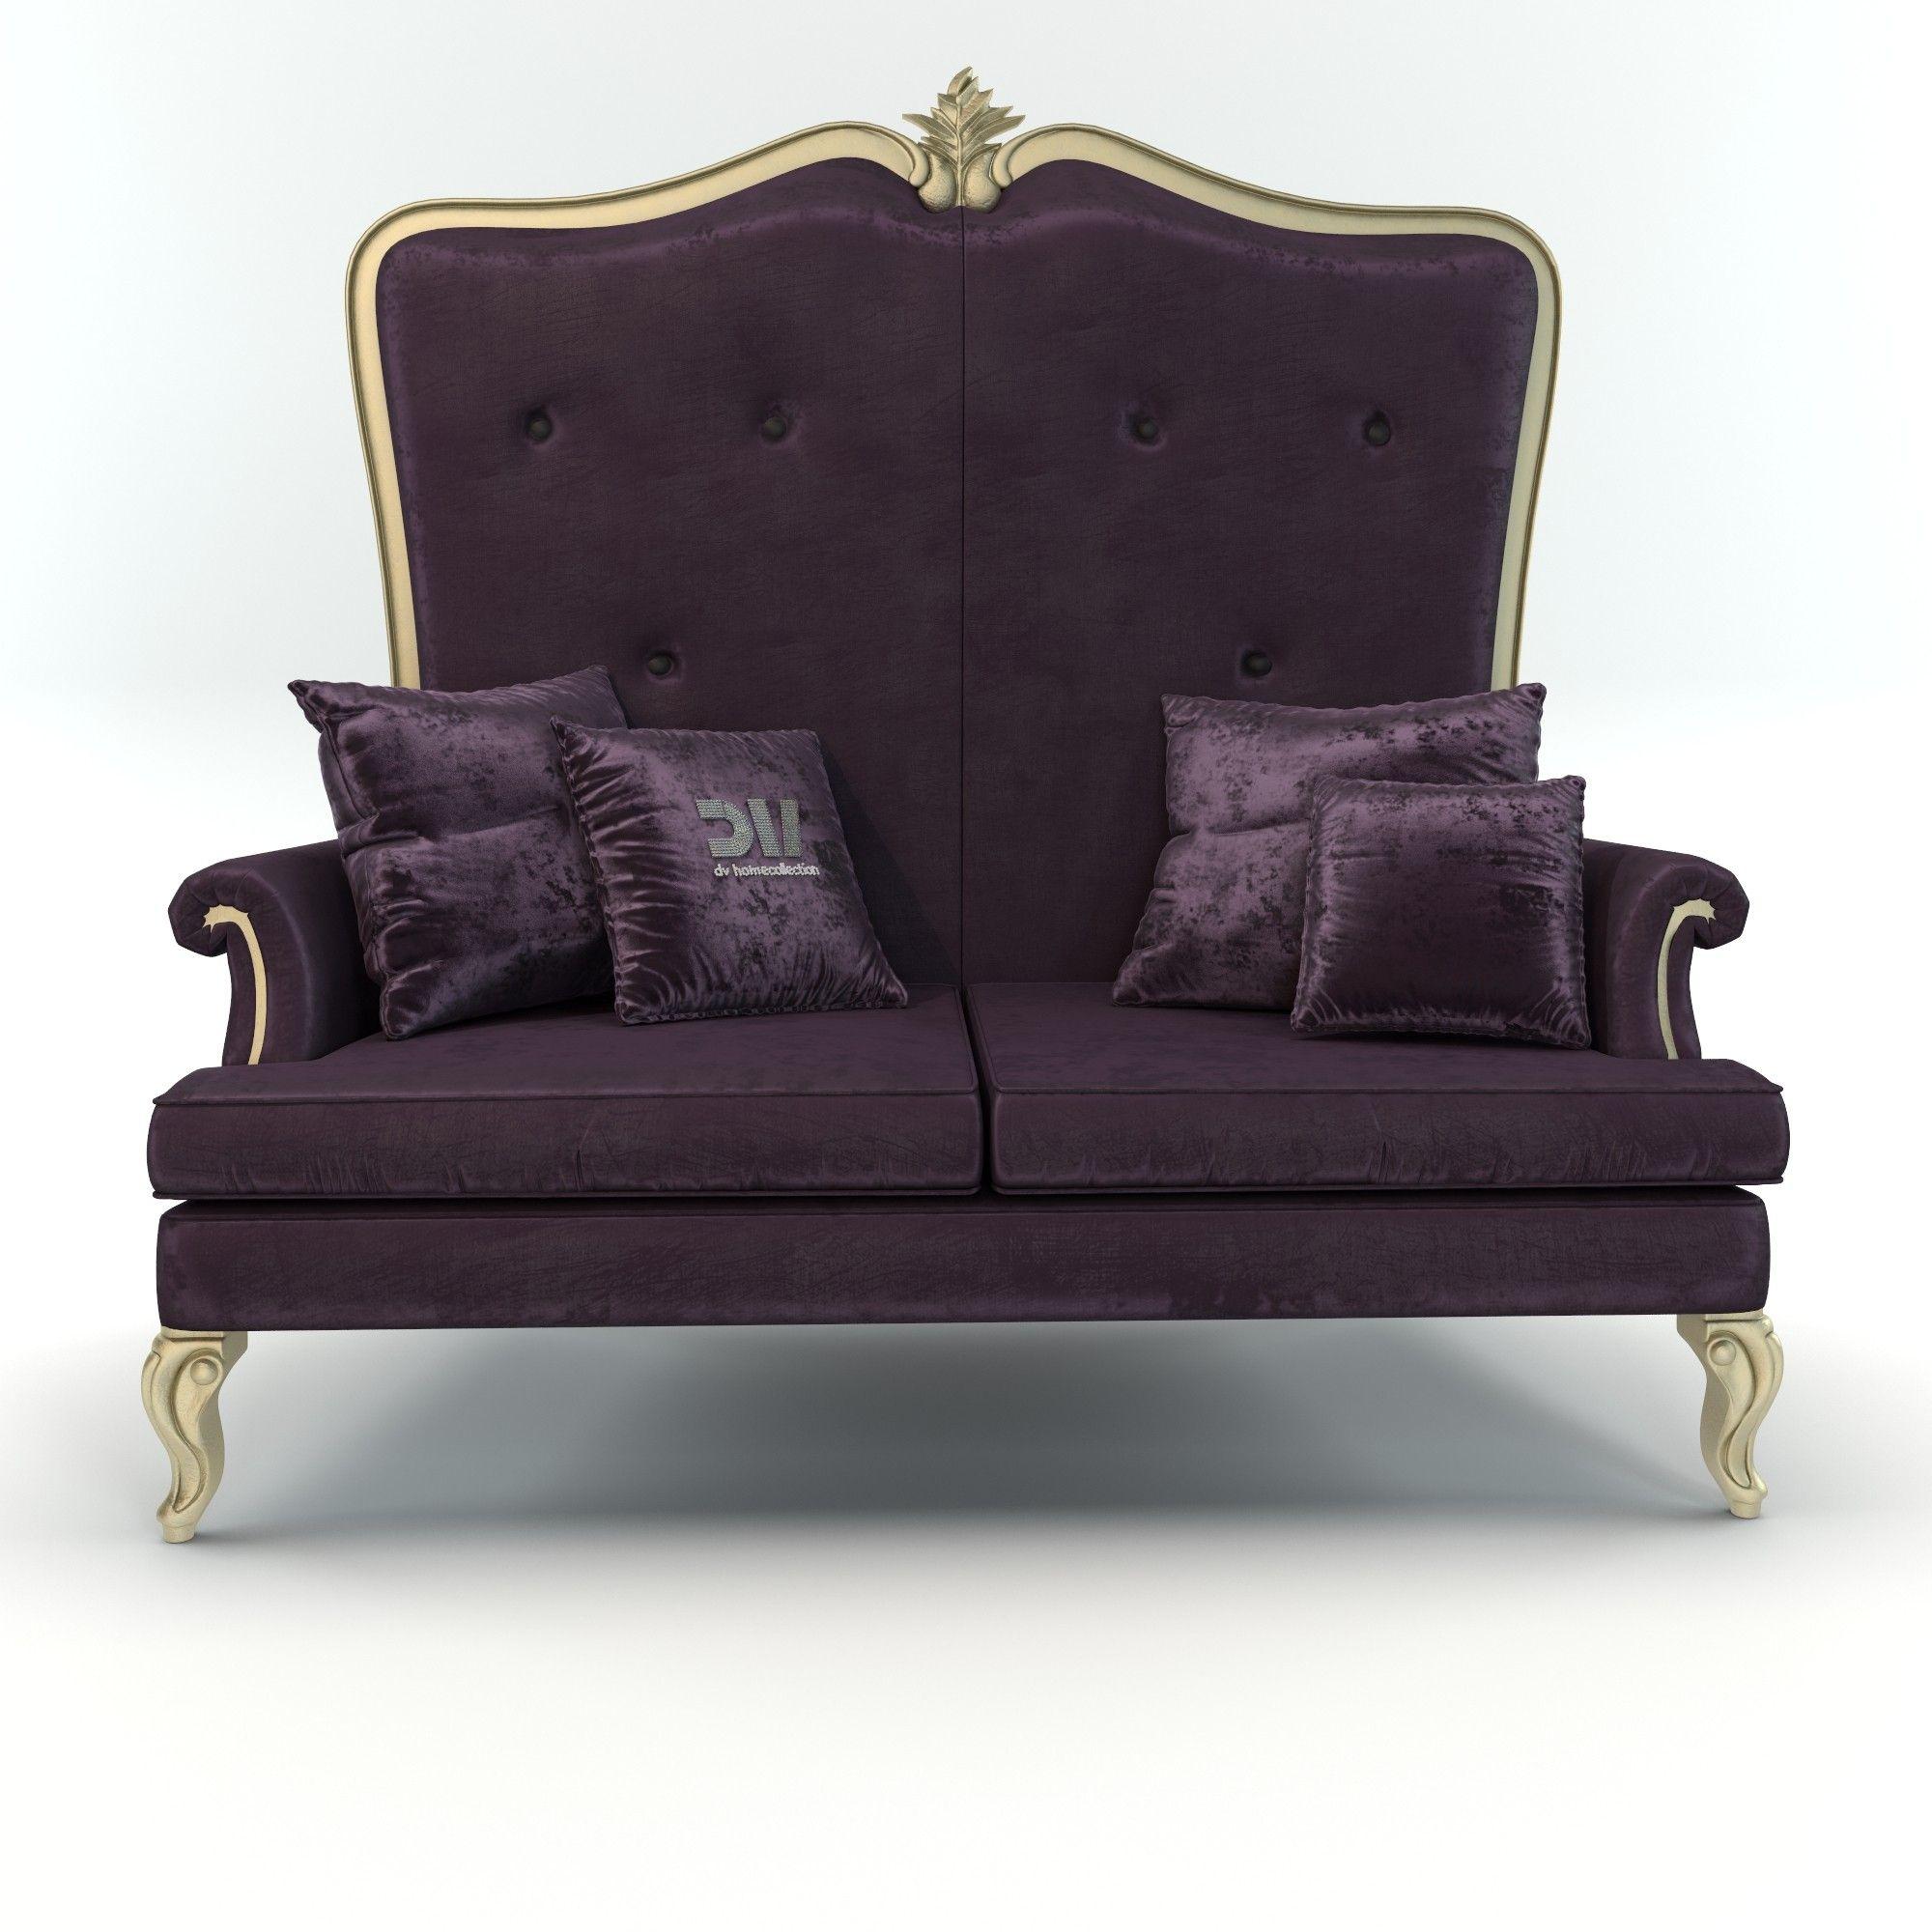 Elegant Italian Furniture royal classic elegant italian vogue sofadv home collection. 3d